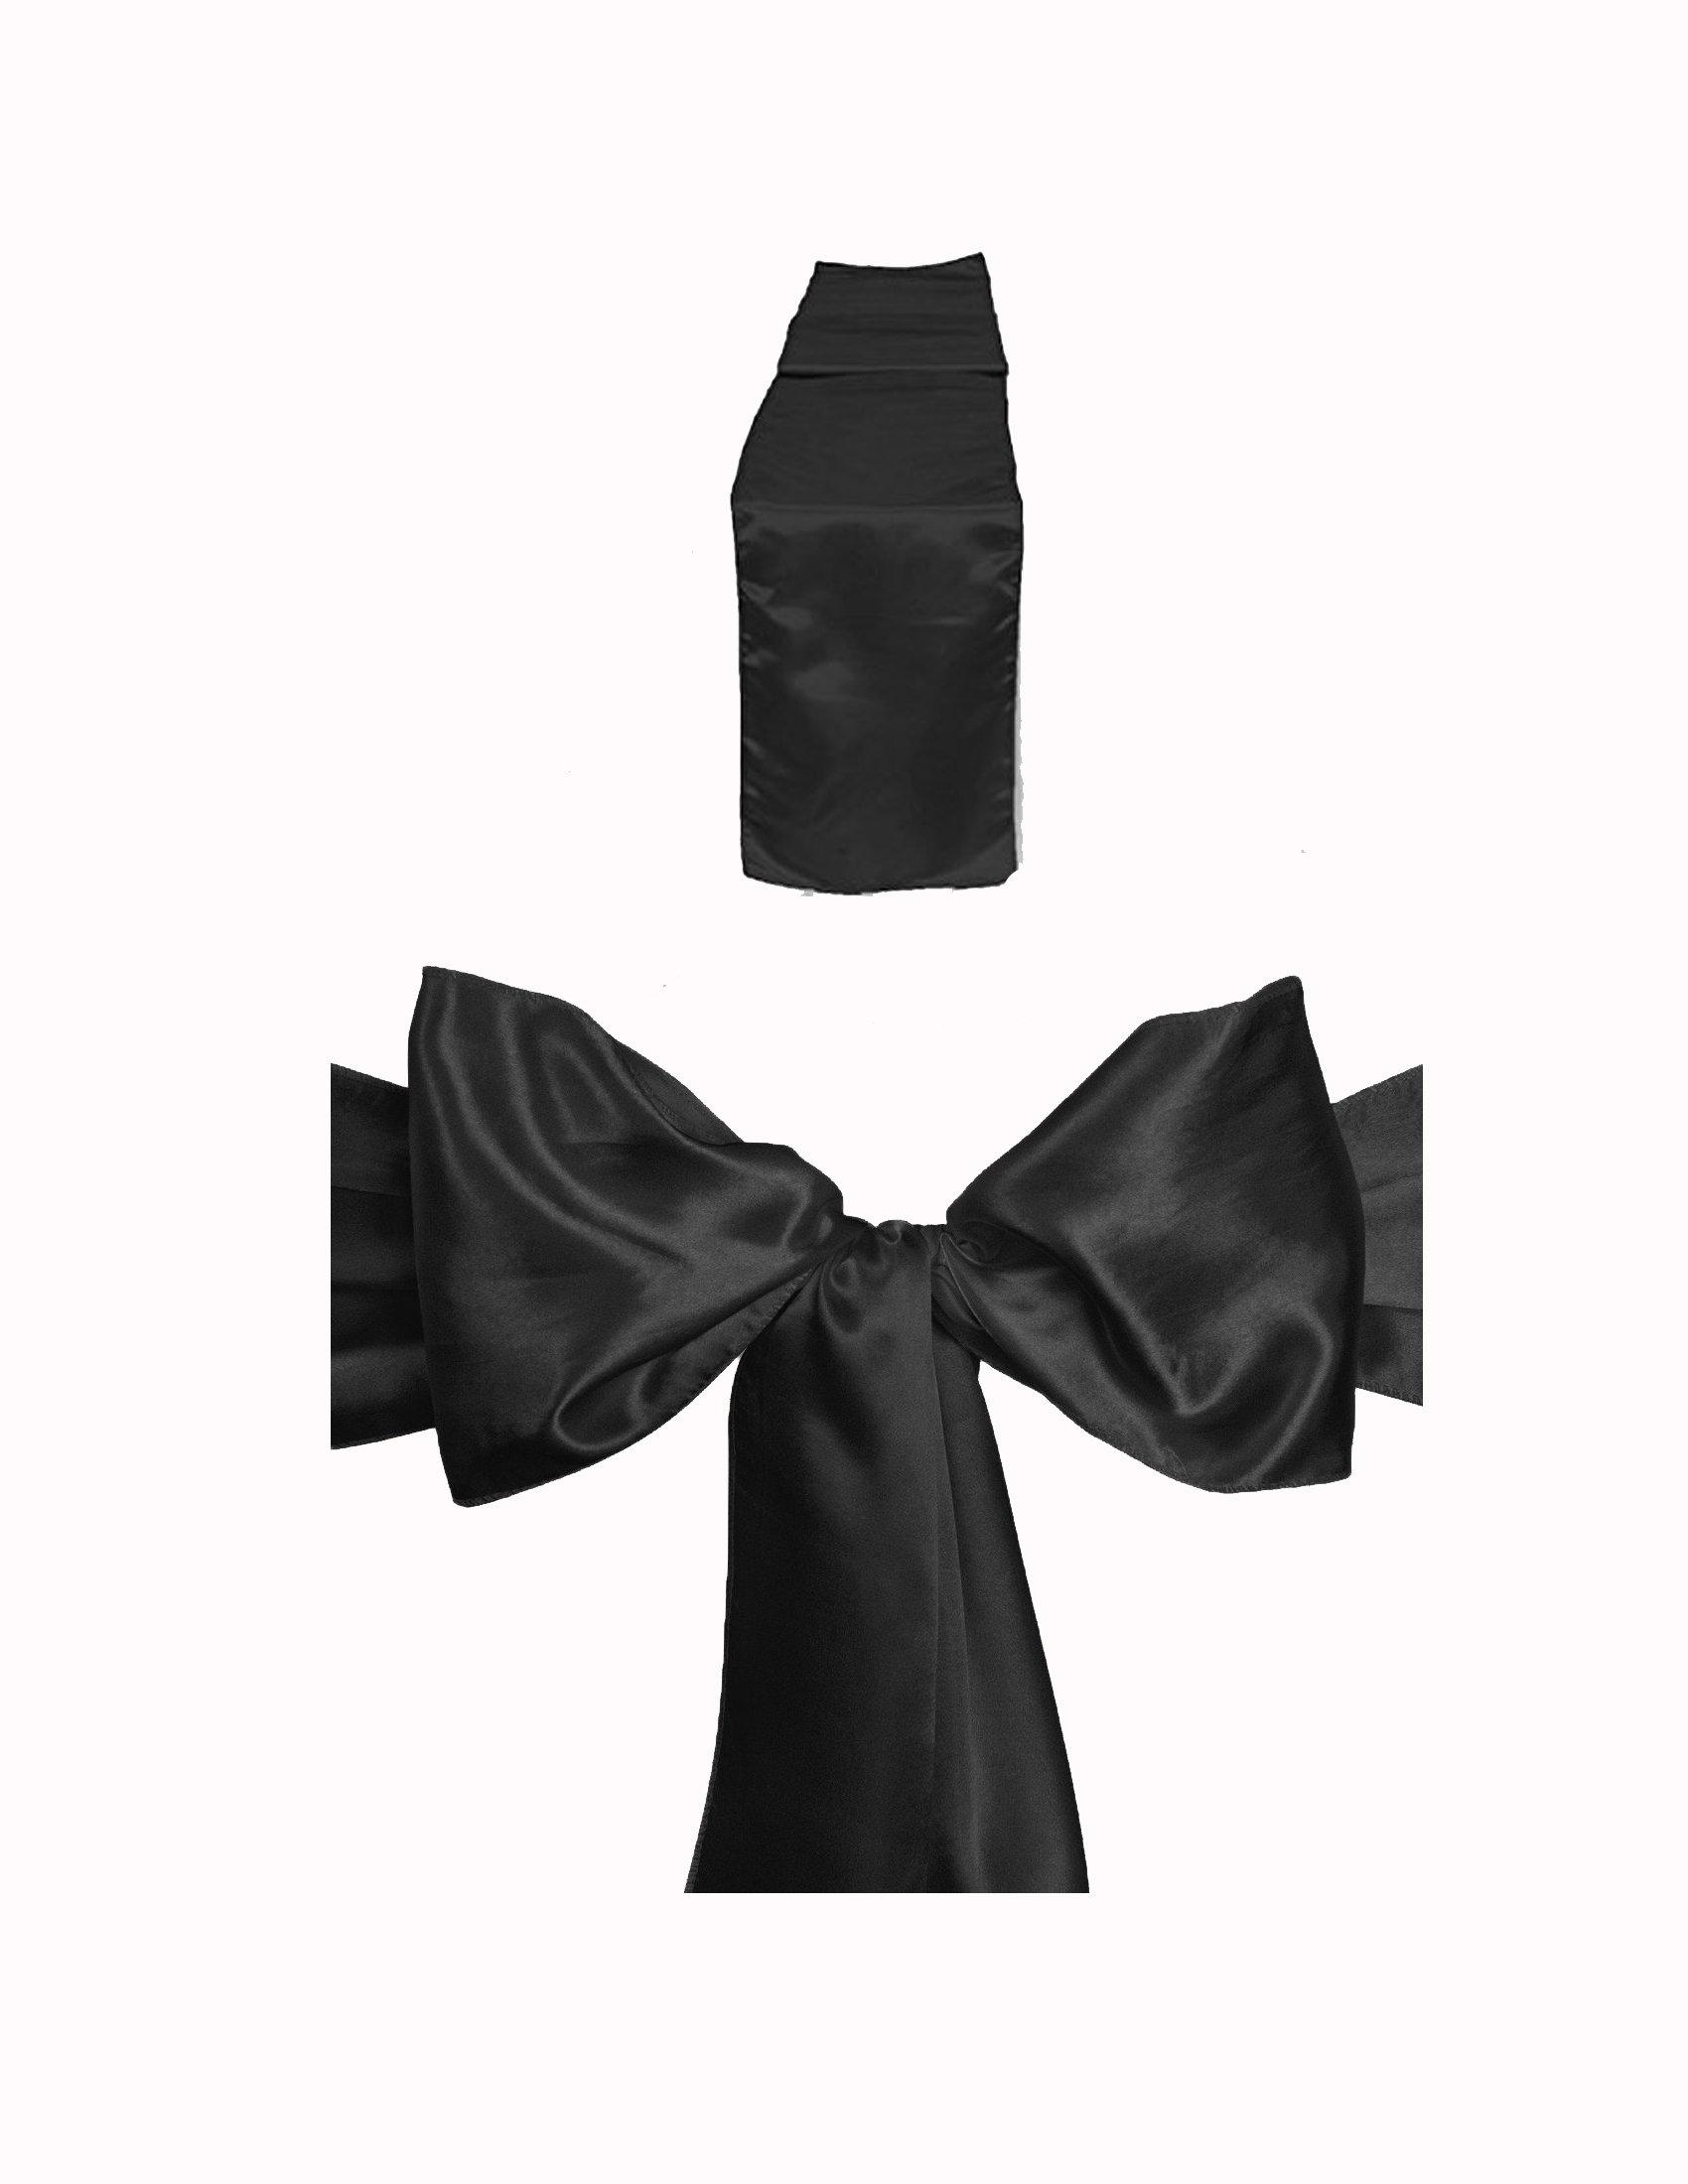 Elina Home Combo Satin Pack 10 Table Runner 12x108Inch & 50 Chair Bow Sash WeddingBanquet Kitchen HomeDecor (Black)